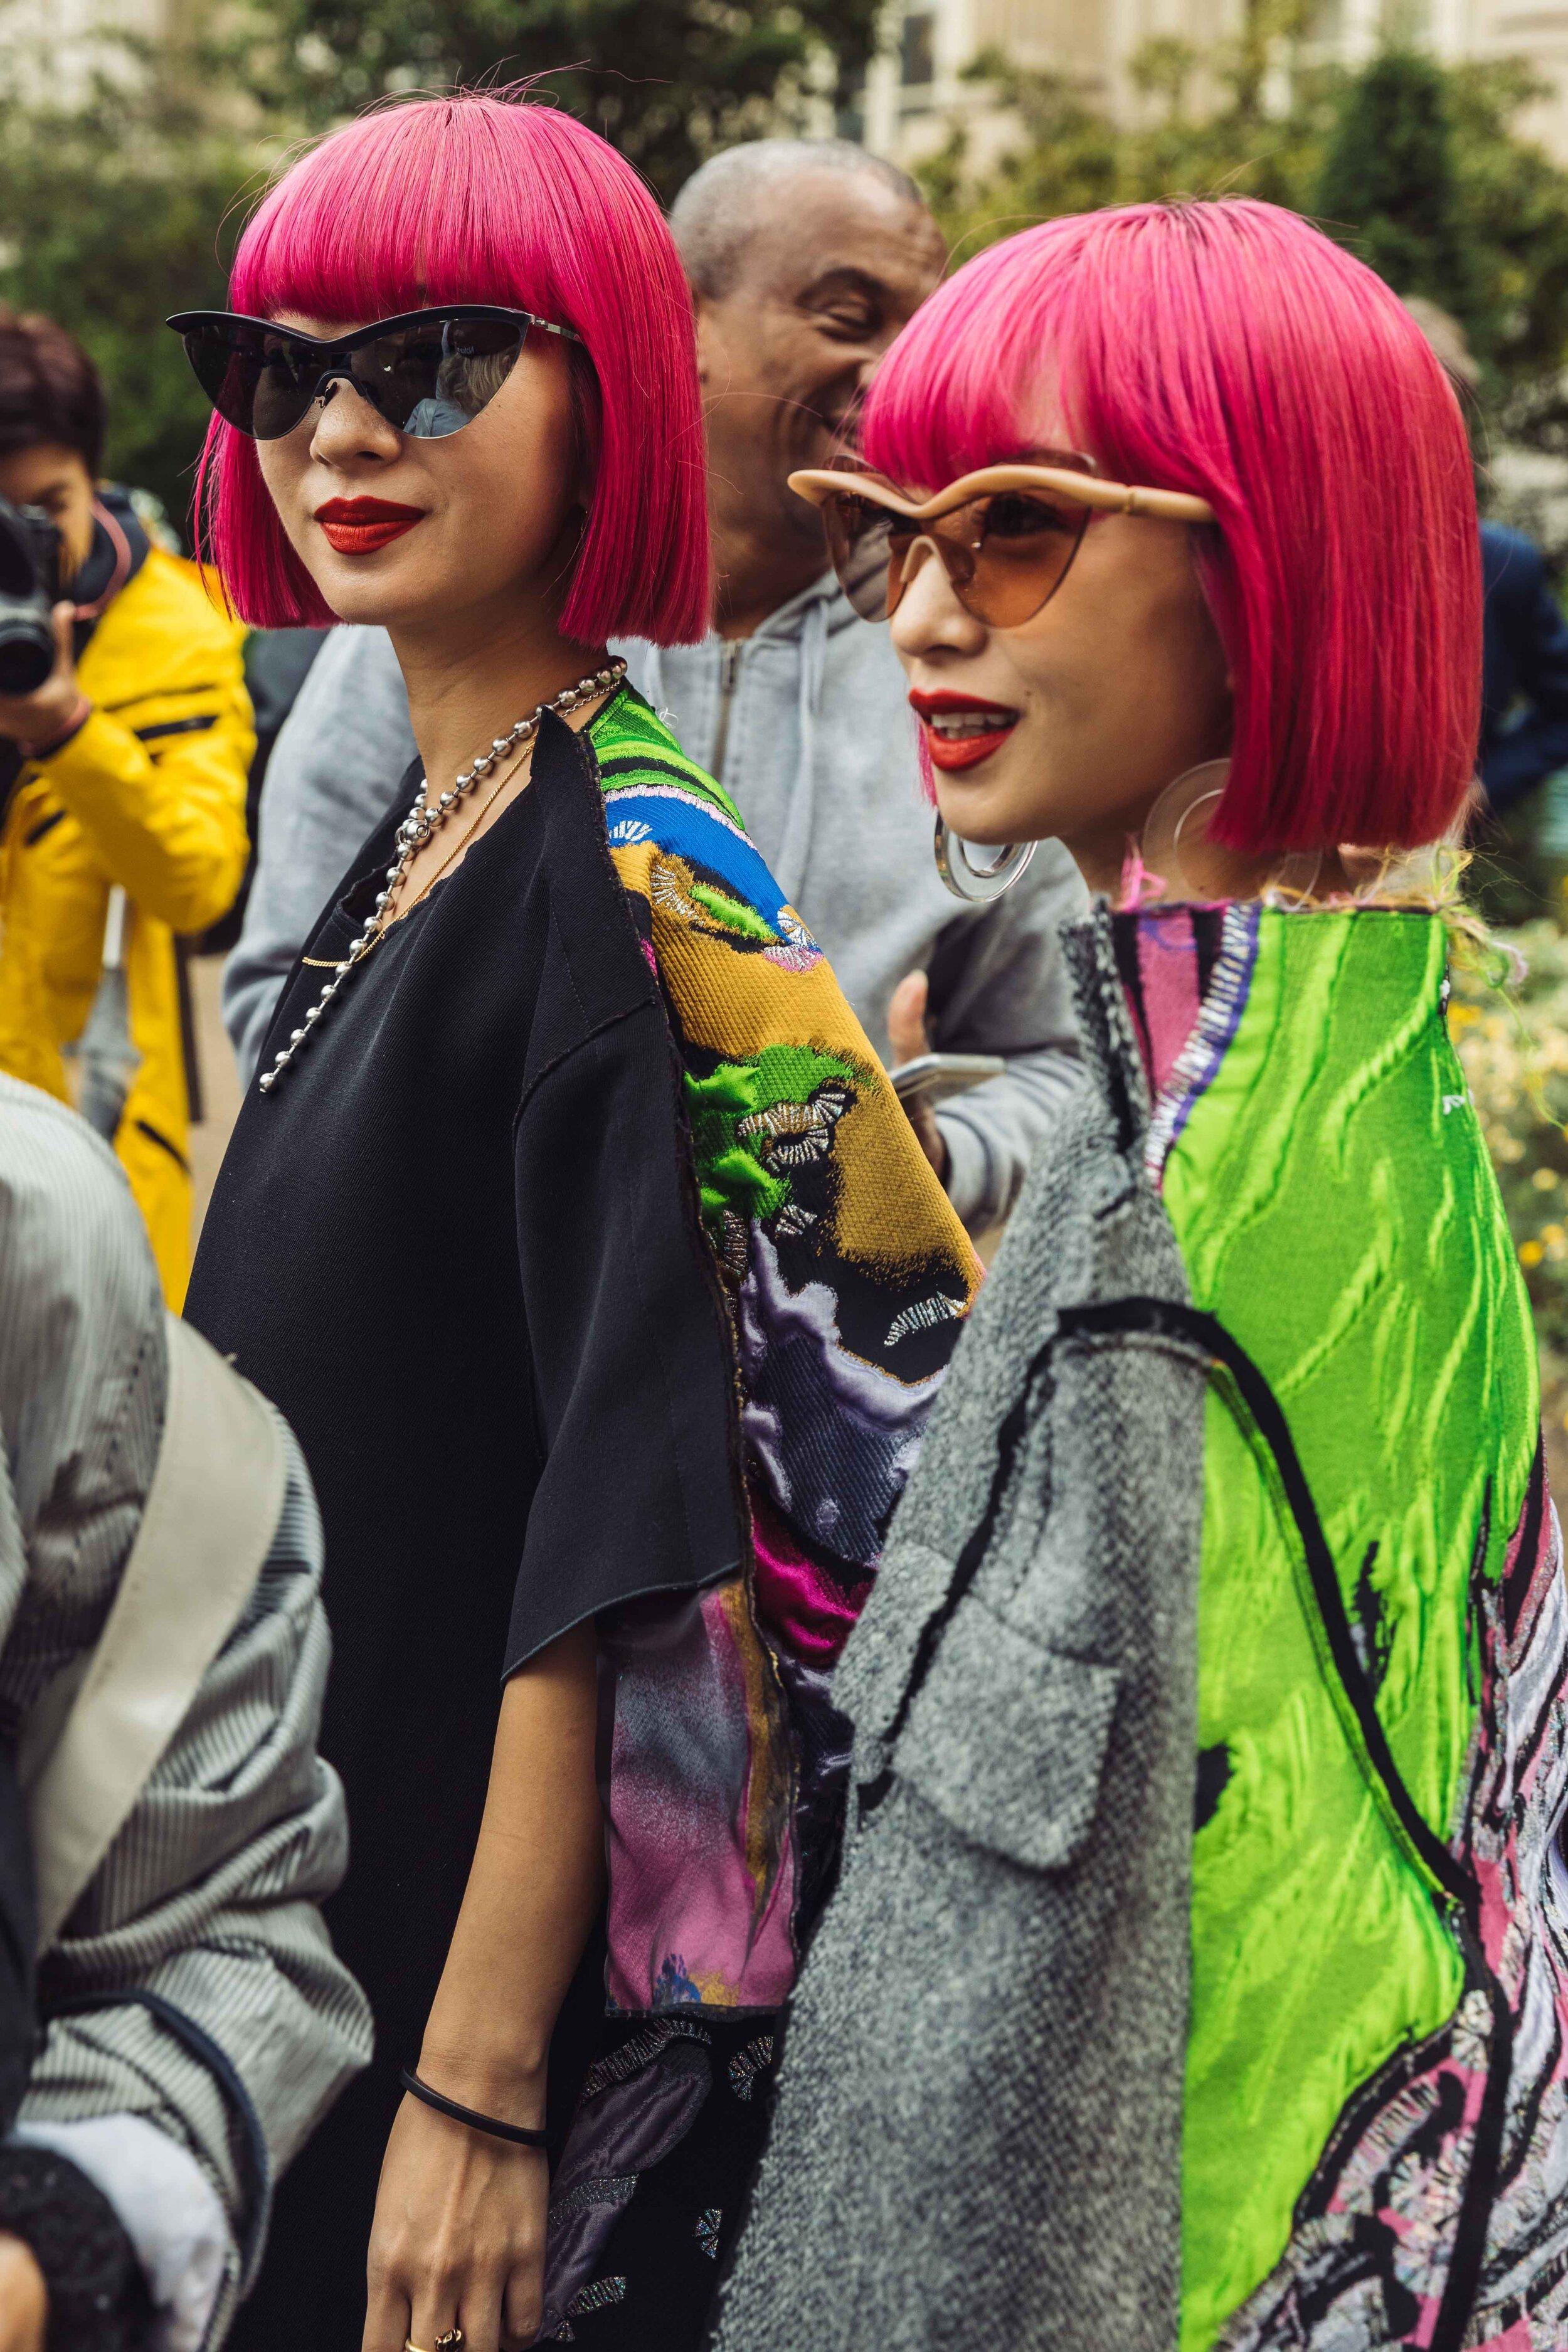 Paris Fashion Week - Maison Margiela